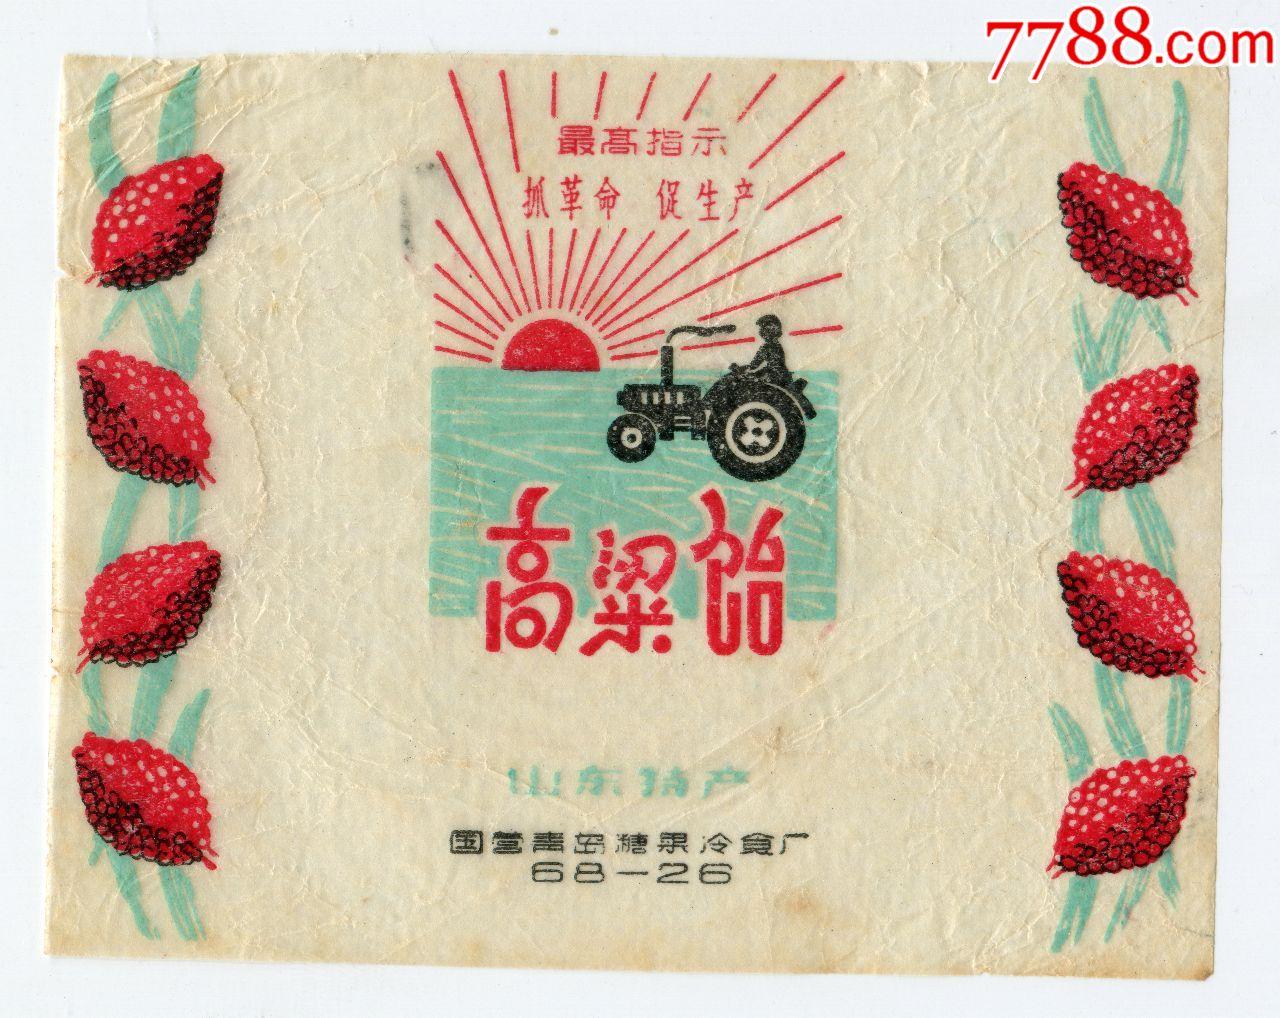 ���I青�u糖果冷食�S高粱��ё罡咧甘咀ジ锩�促生�a(se66680437)_